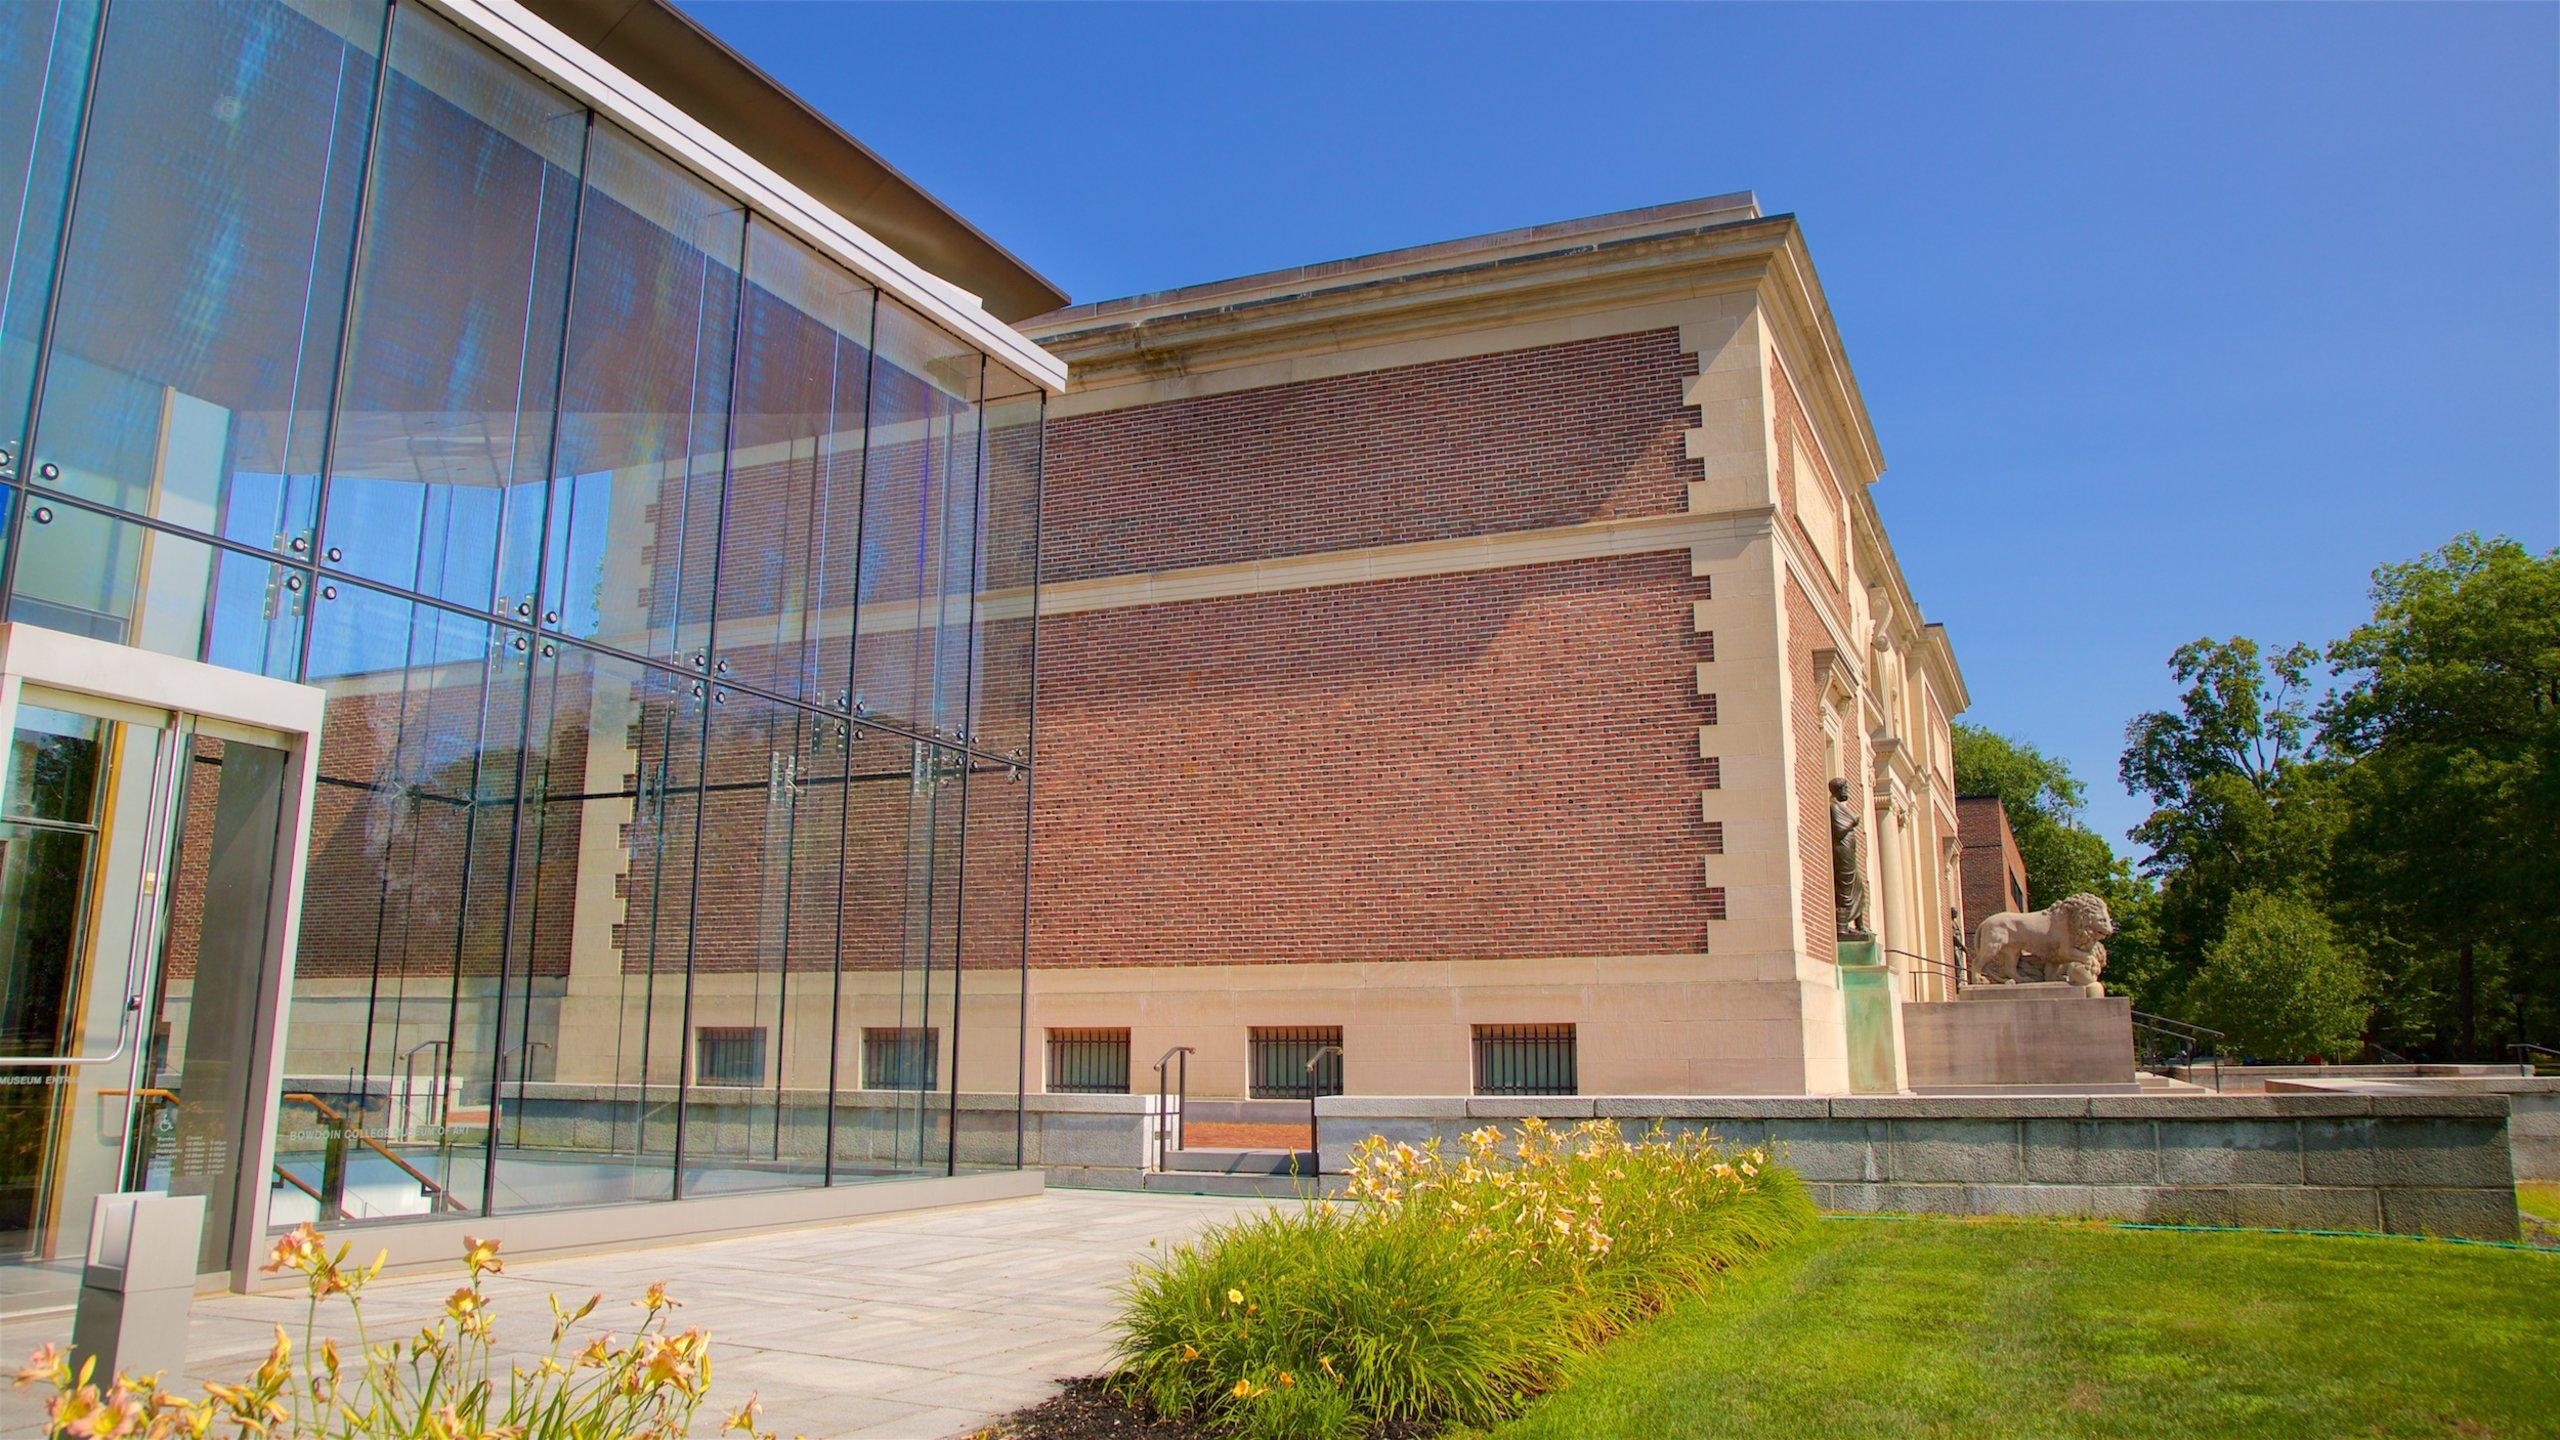 Bowdoin College Museum of Art, Brunswick, Maine, USA